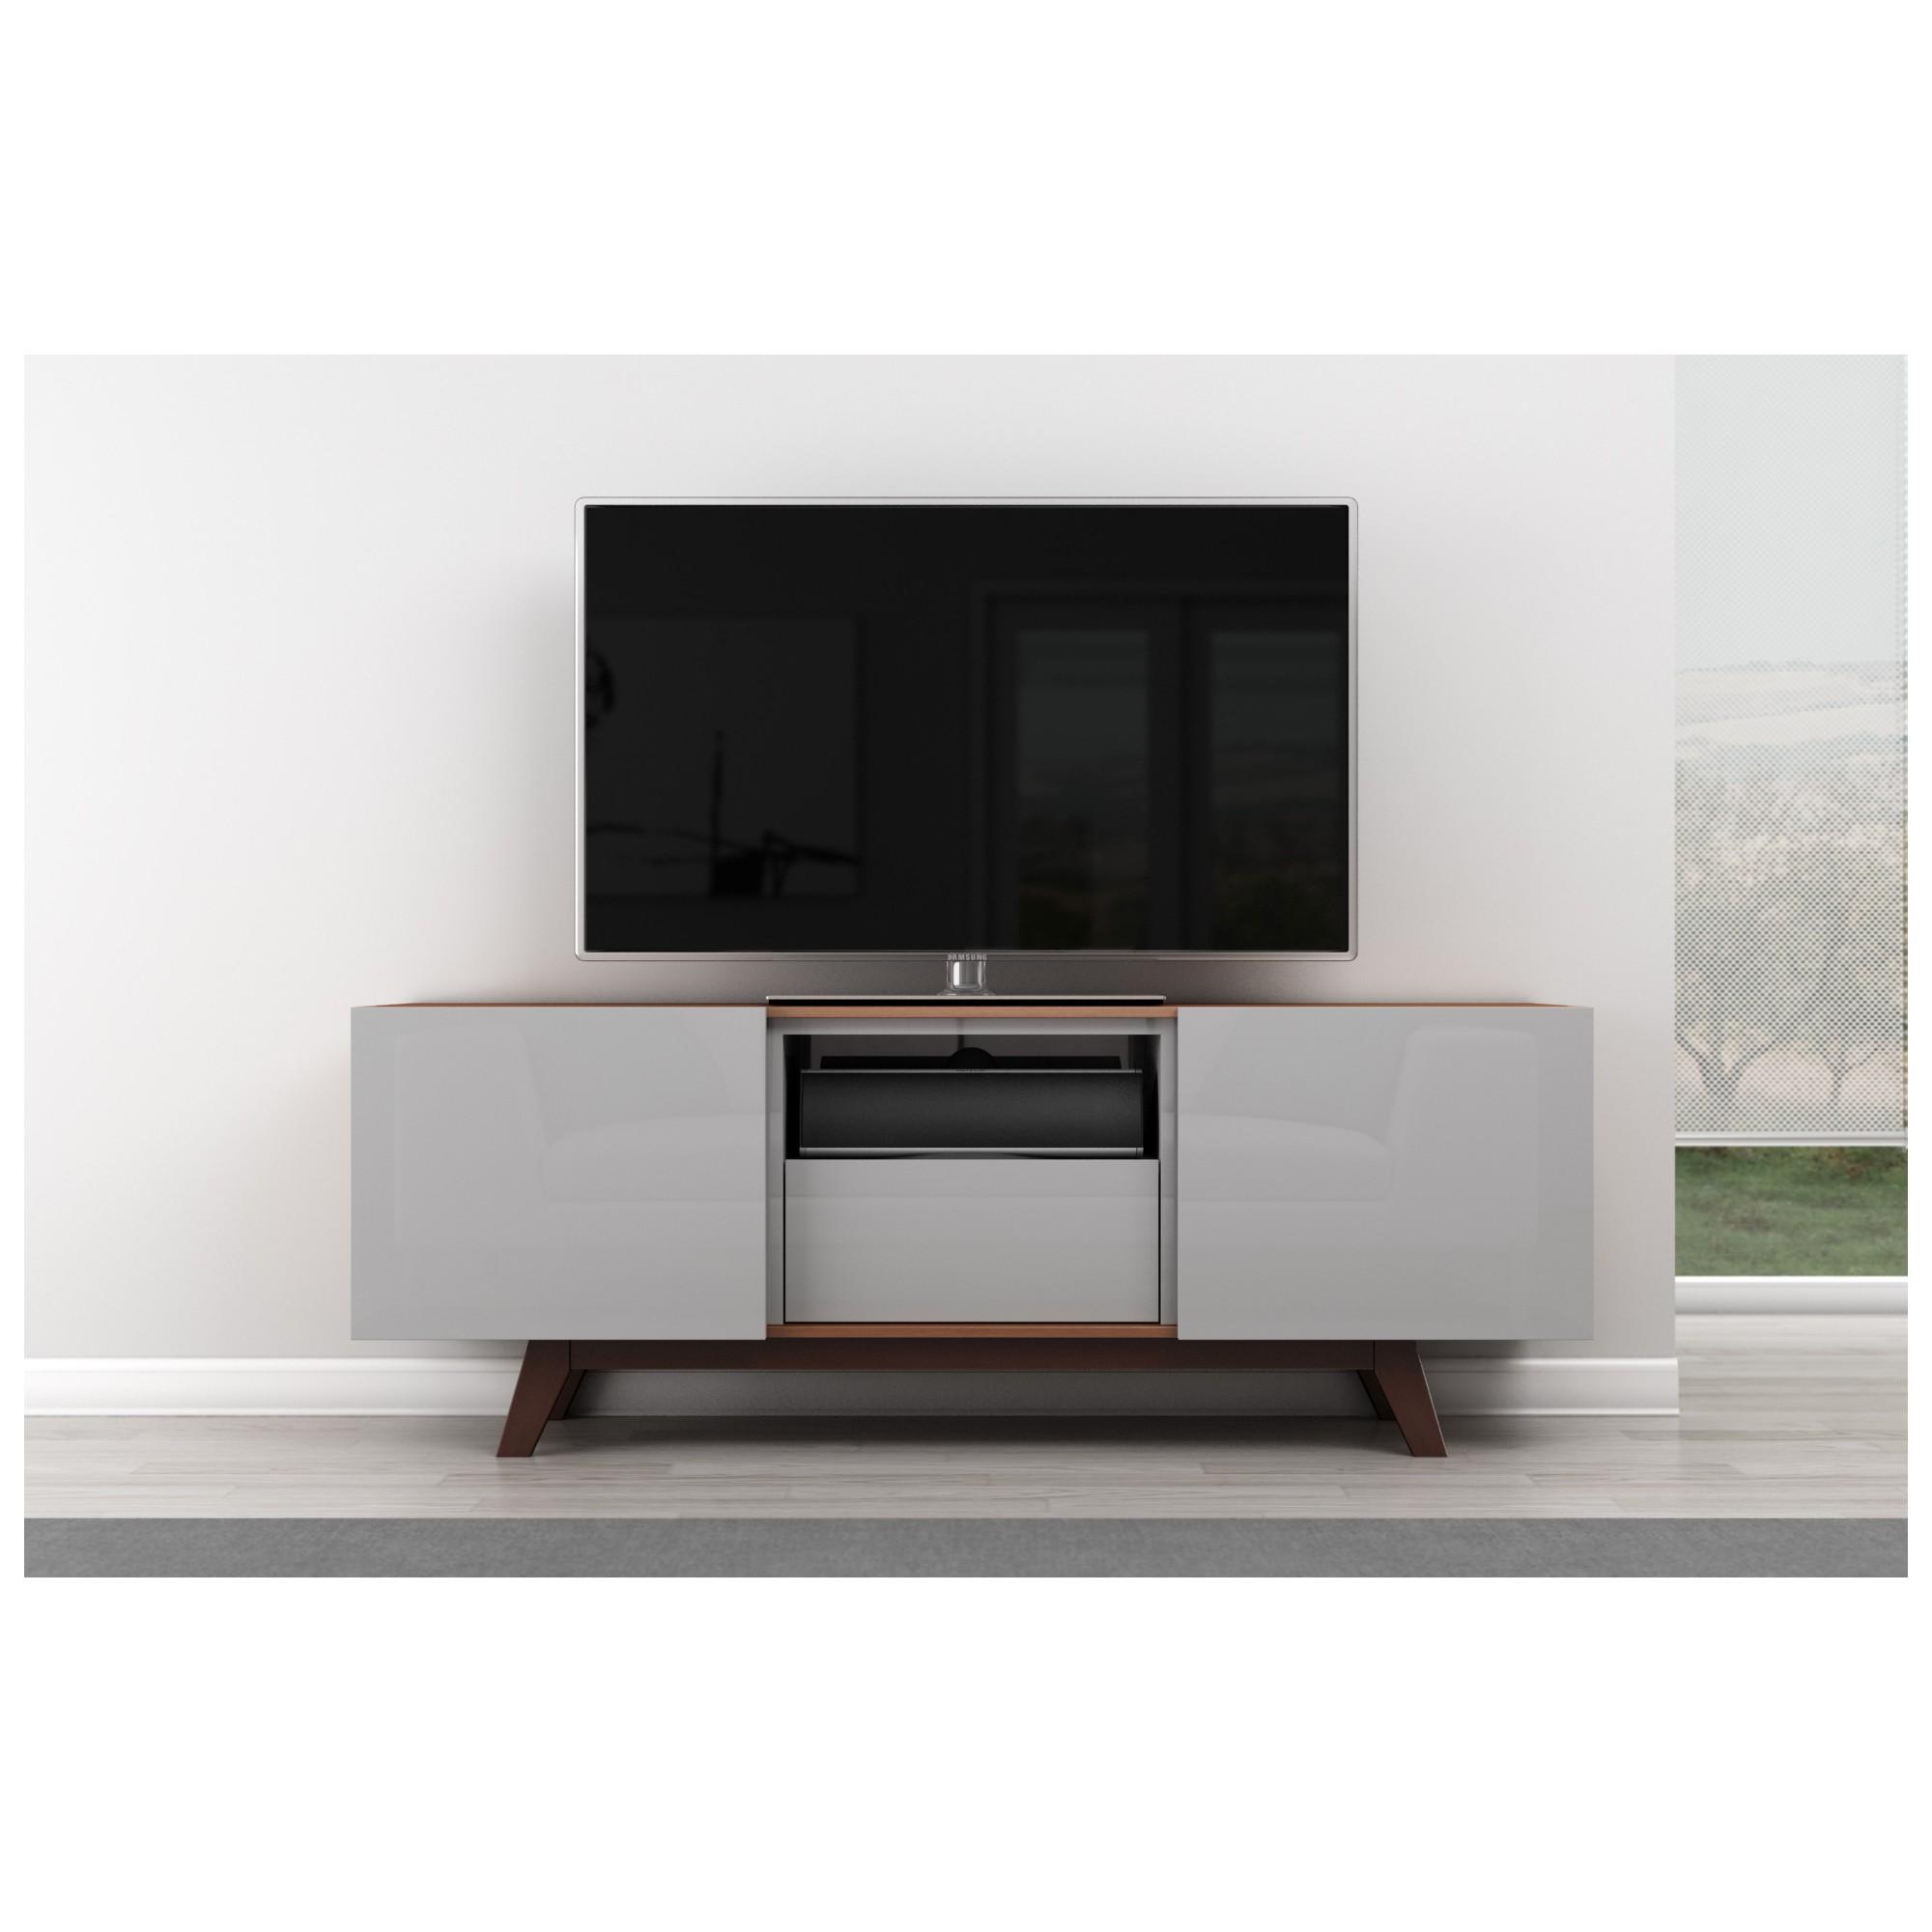 Furnitech FT70R FT70R 70 TV Stand Modern Media Cabinet W Italian Veneer Amp Light Grey High